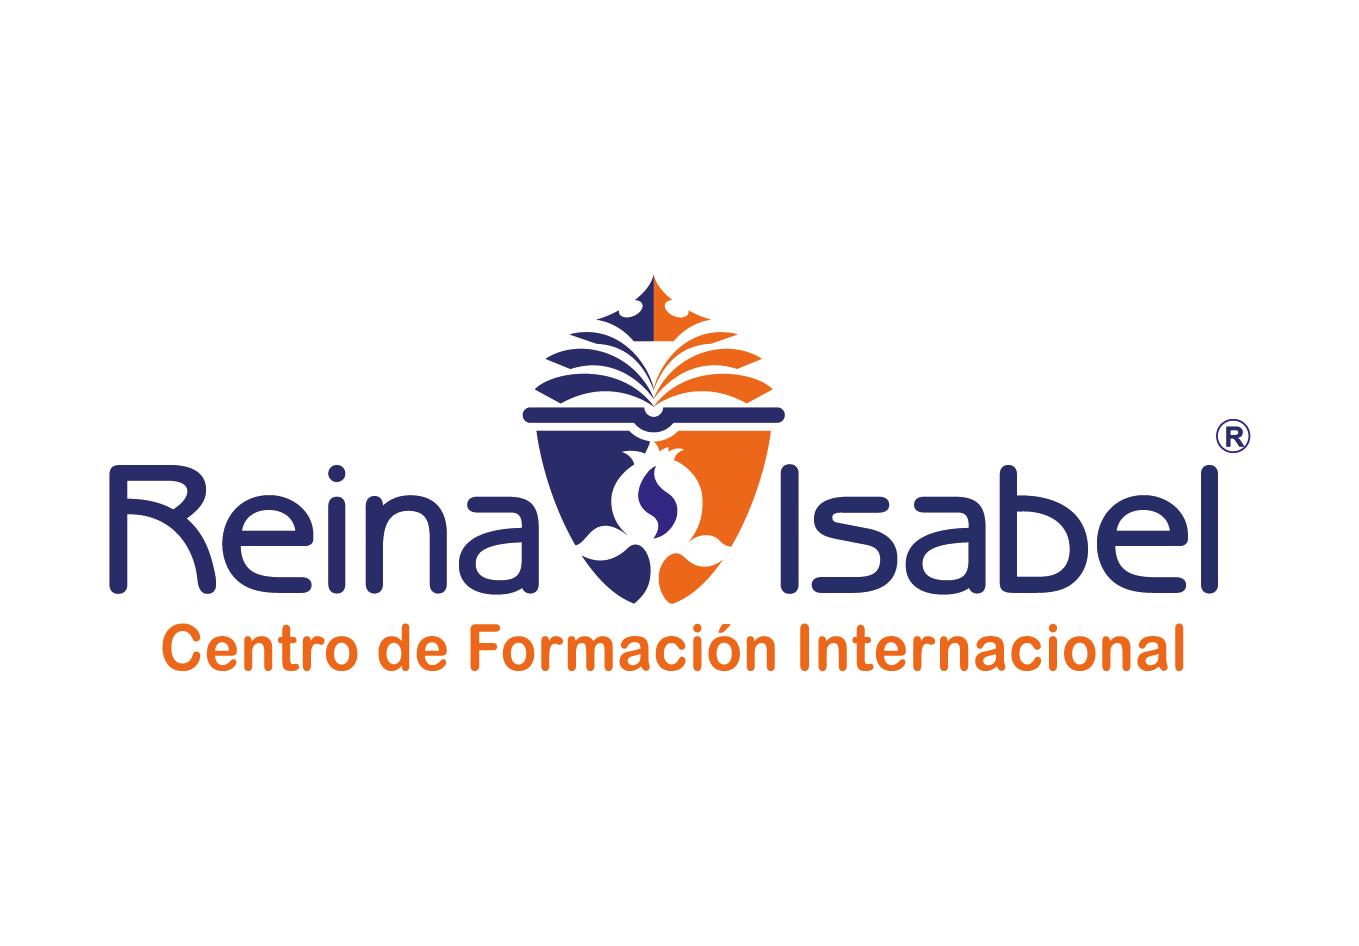 Centro de Formación Internacional Reina Isabel